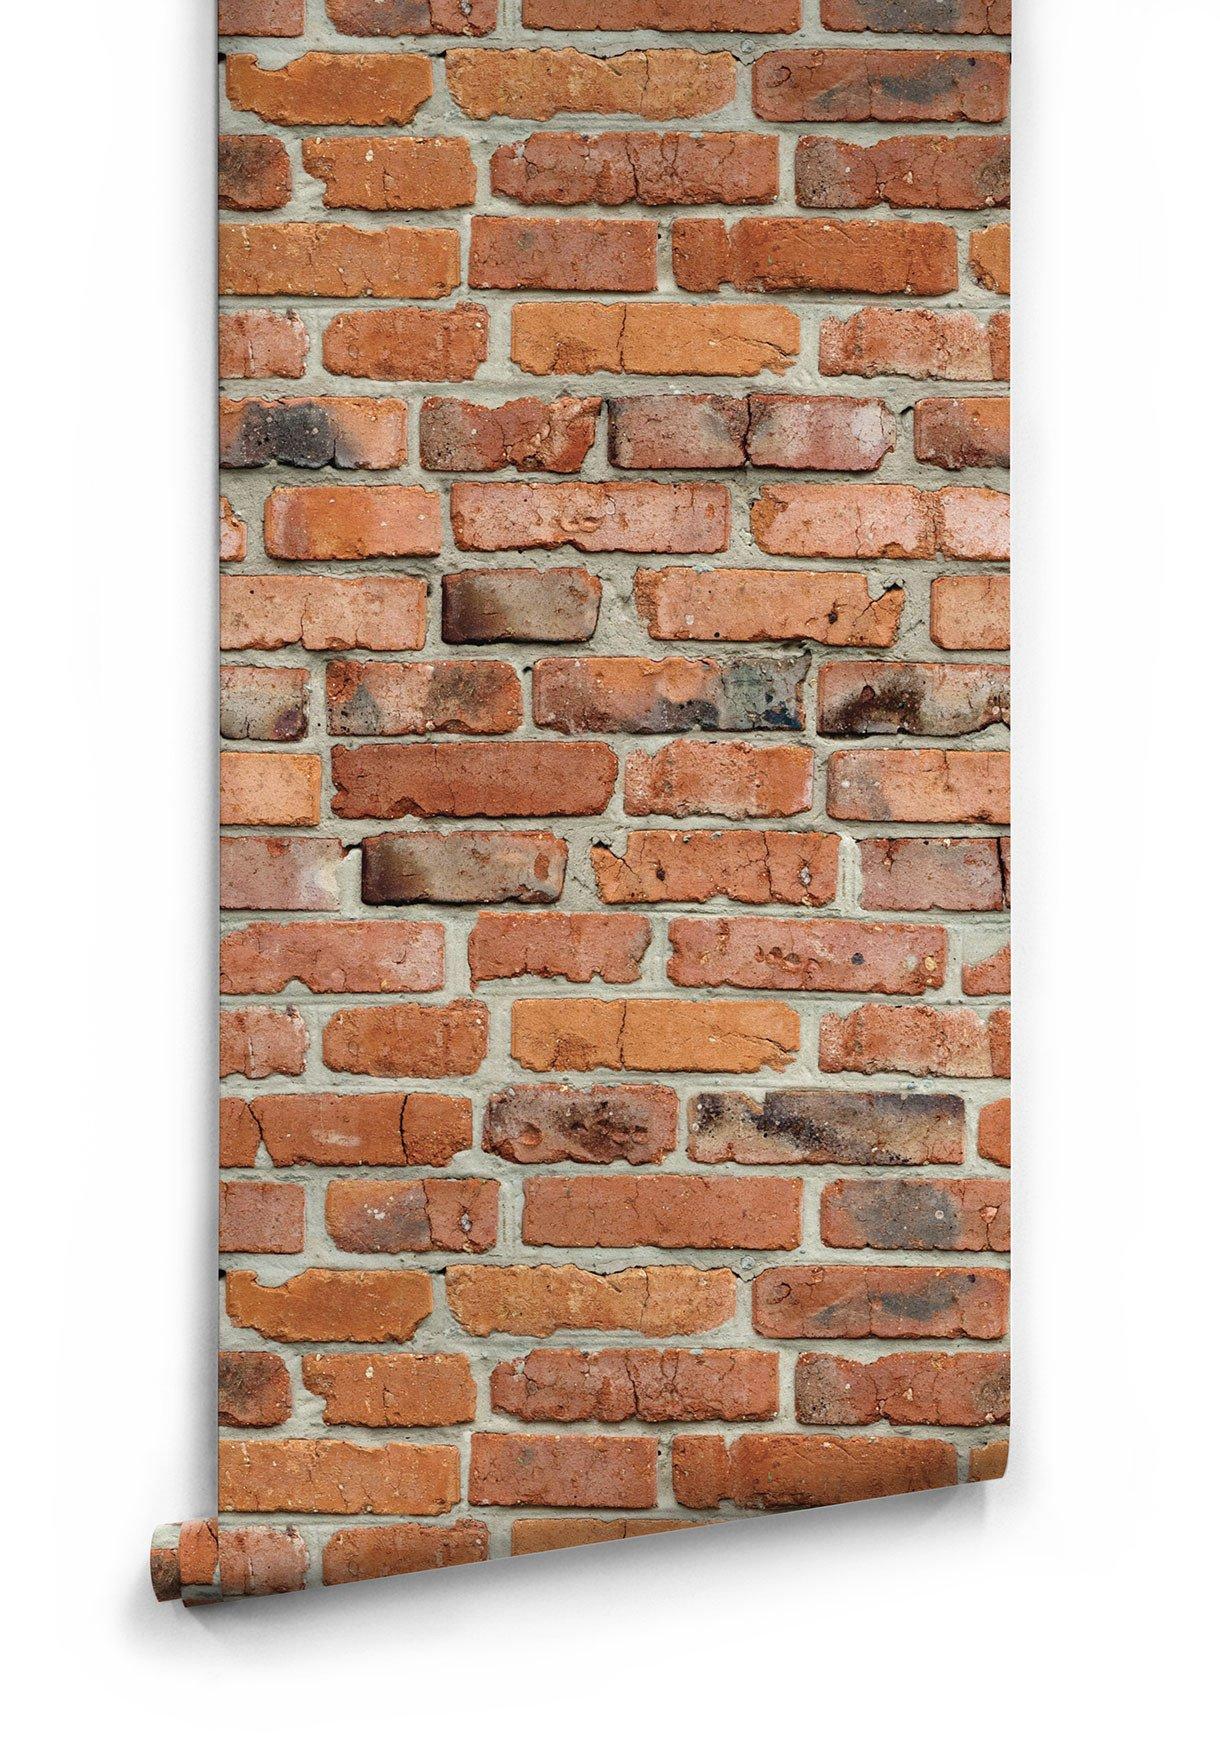 Camden Factory Bricks Wallpaper design by Milton King BURKE DECOR 1220x1745